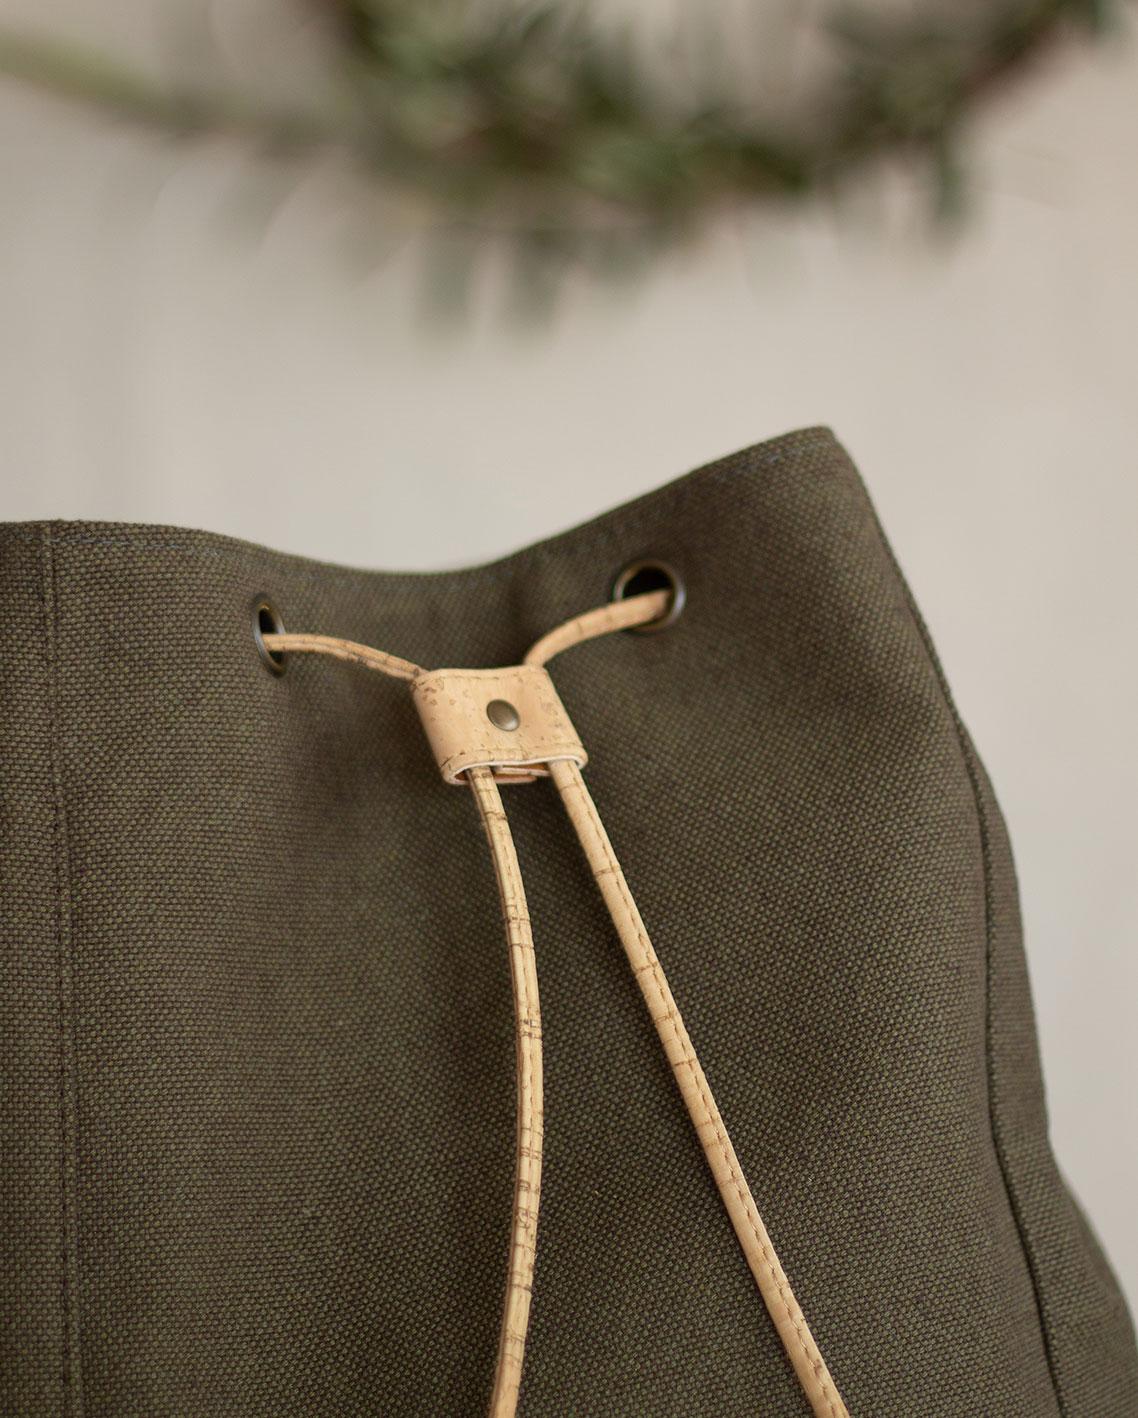 mochila-hombre-de-tela-detalle